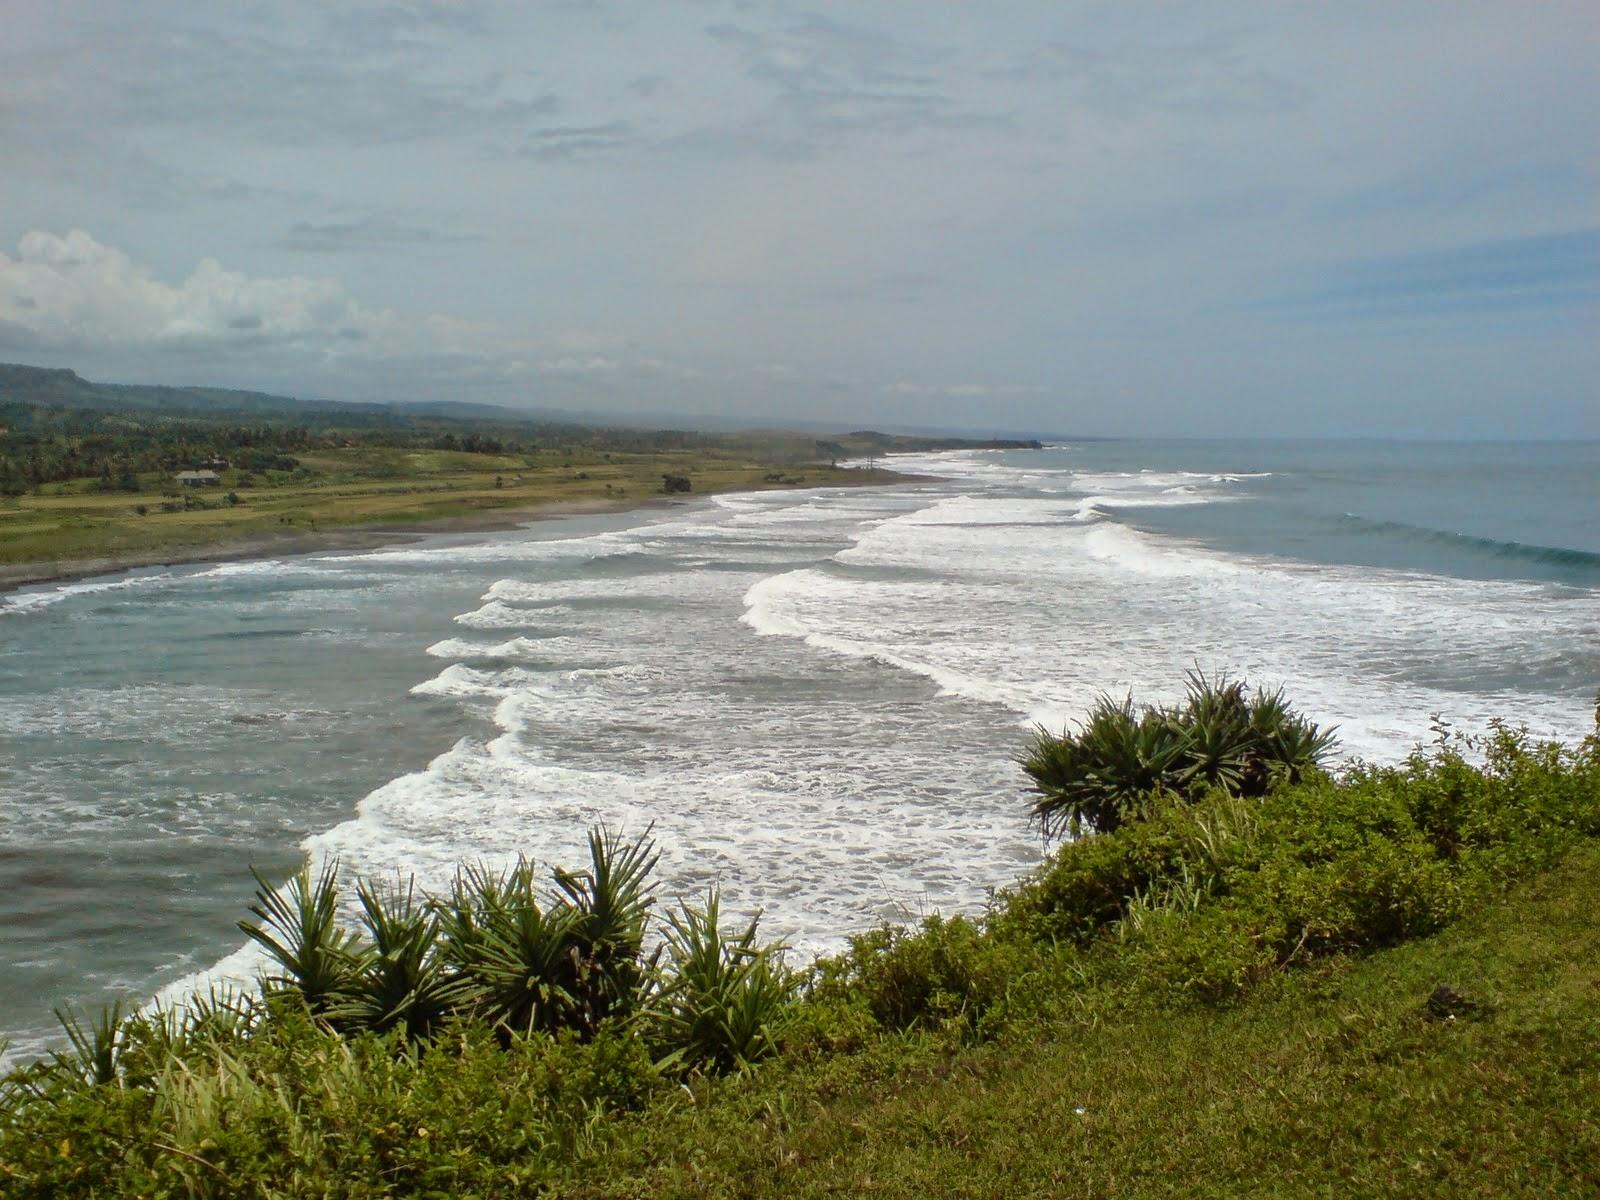 Objek Wisata Pantai Ranca Buaya Garut Jawa Barat